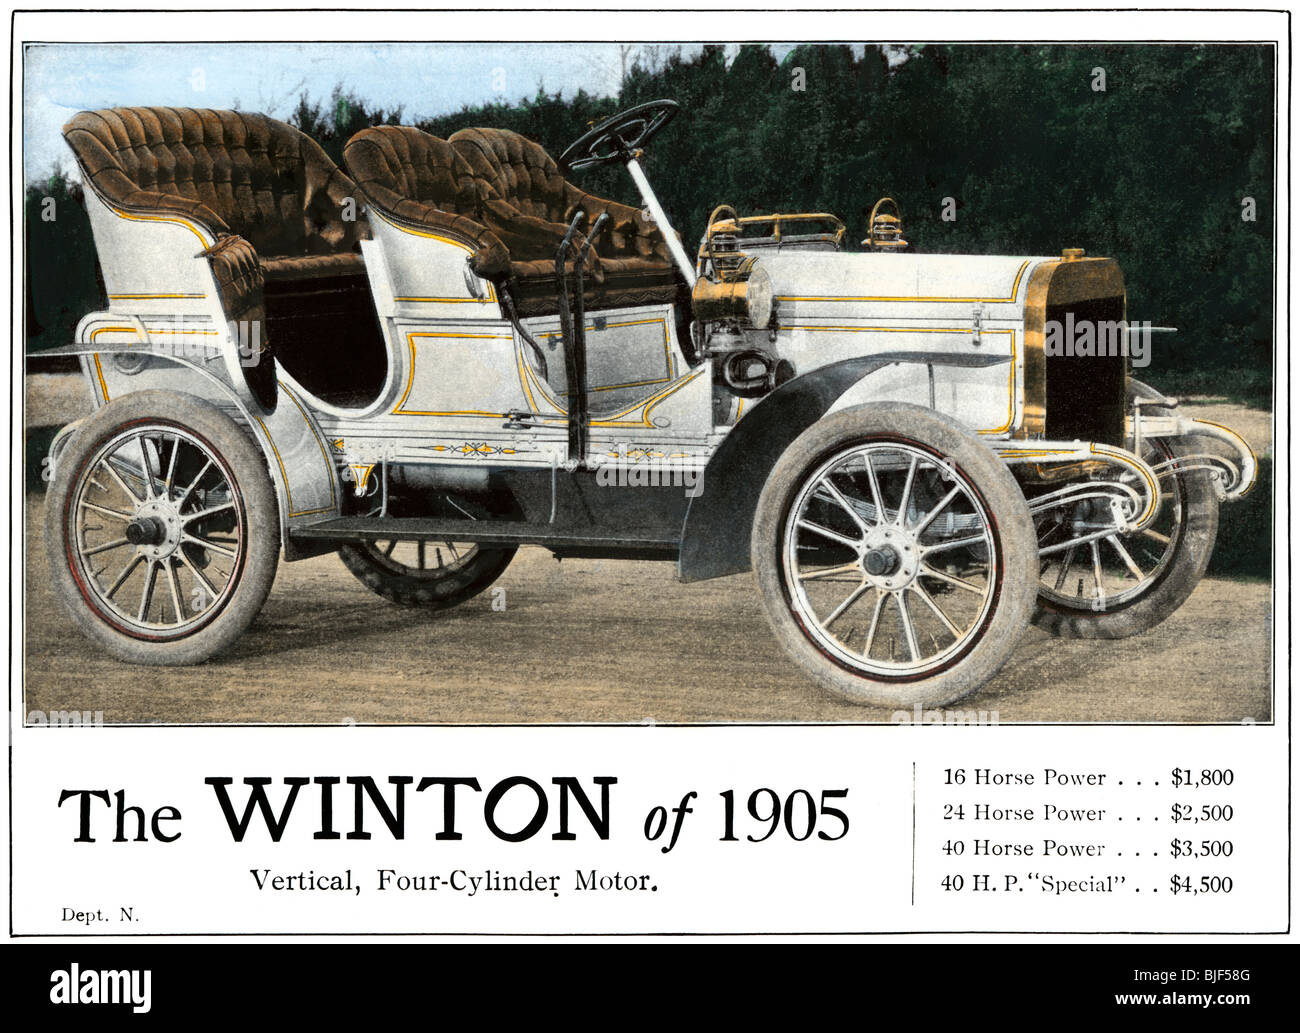 Vintage Car Stock Photos & Vintage Car Stock Images - Alamy